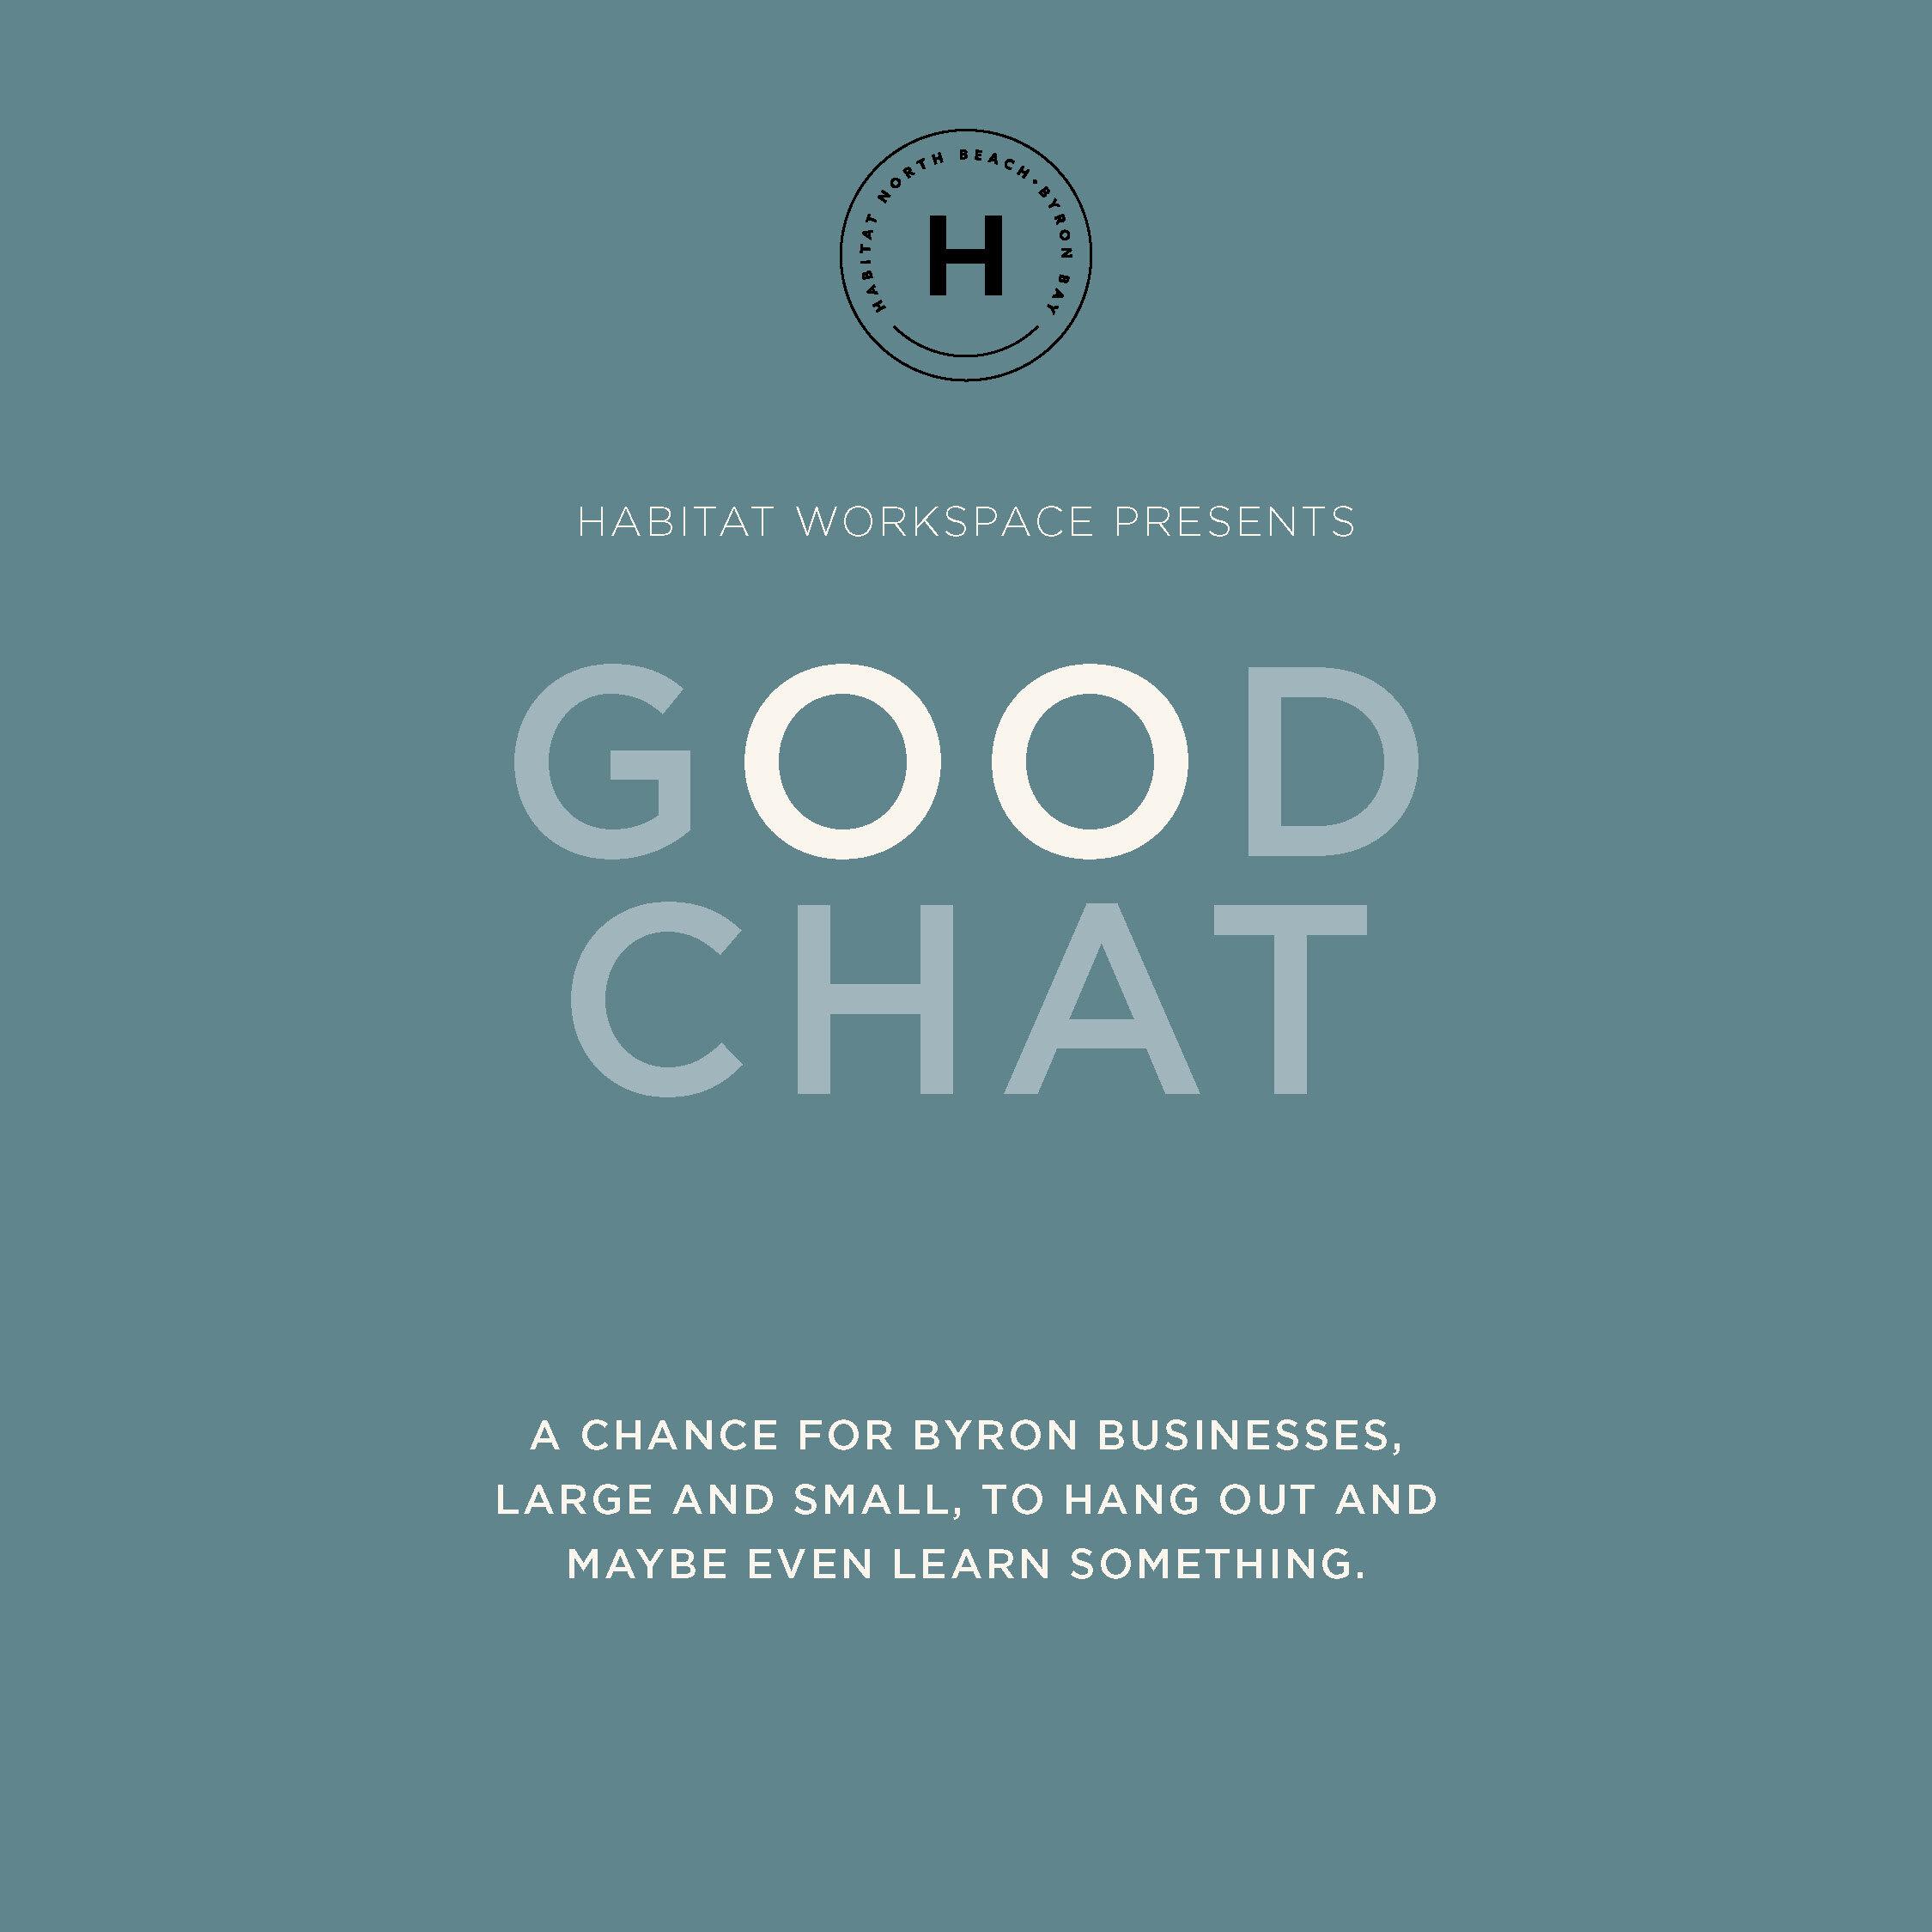 Good Chat IG Tile 02 (1).jpg